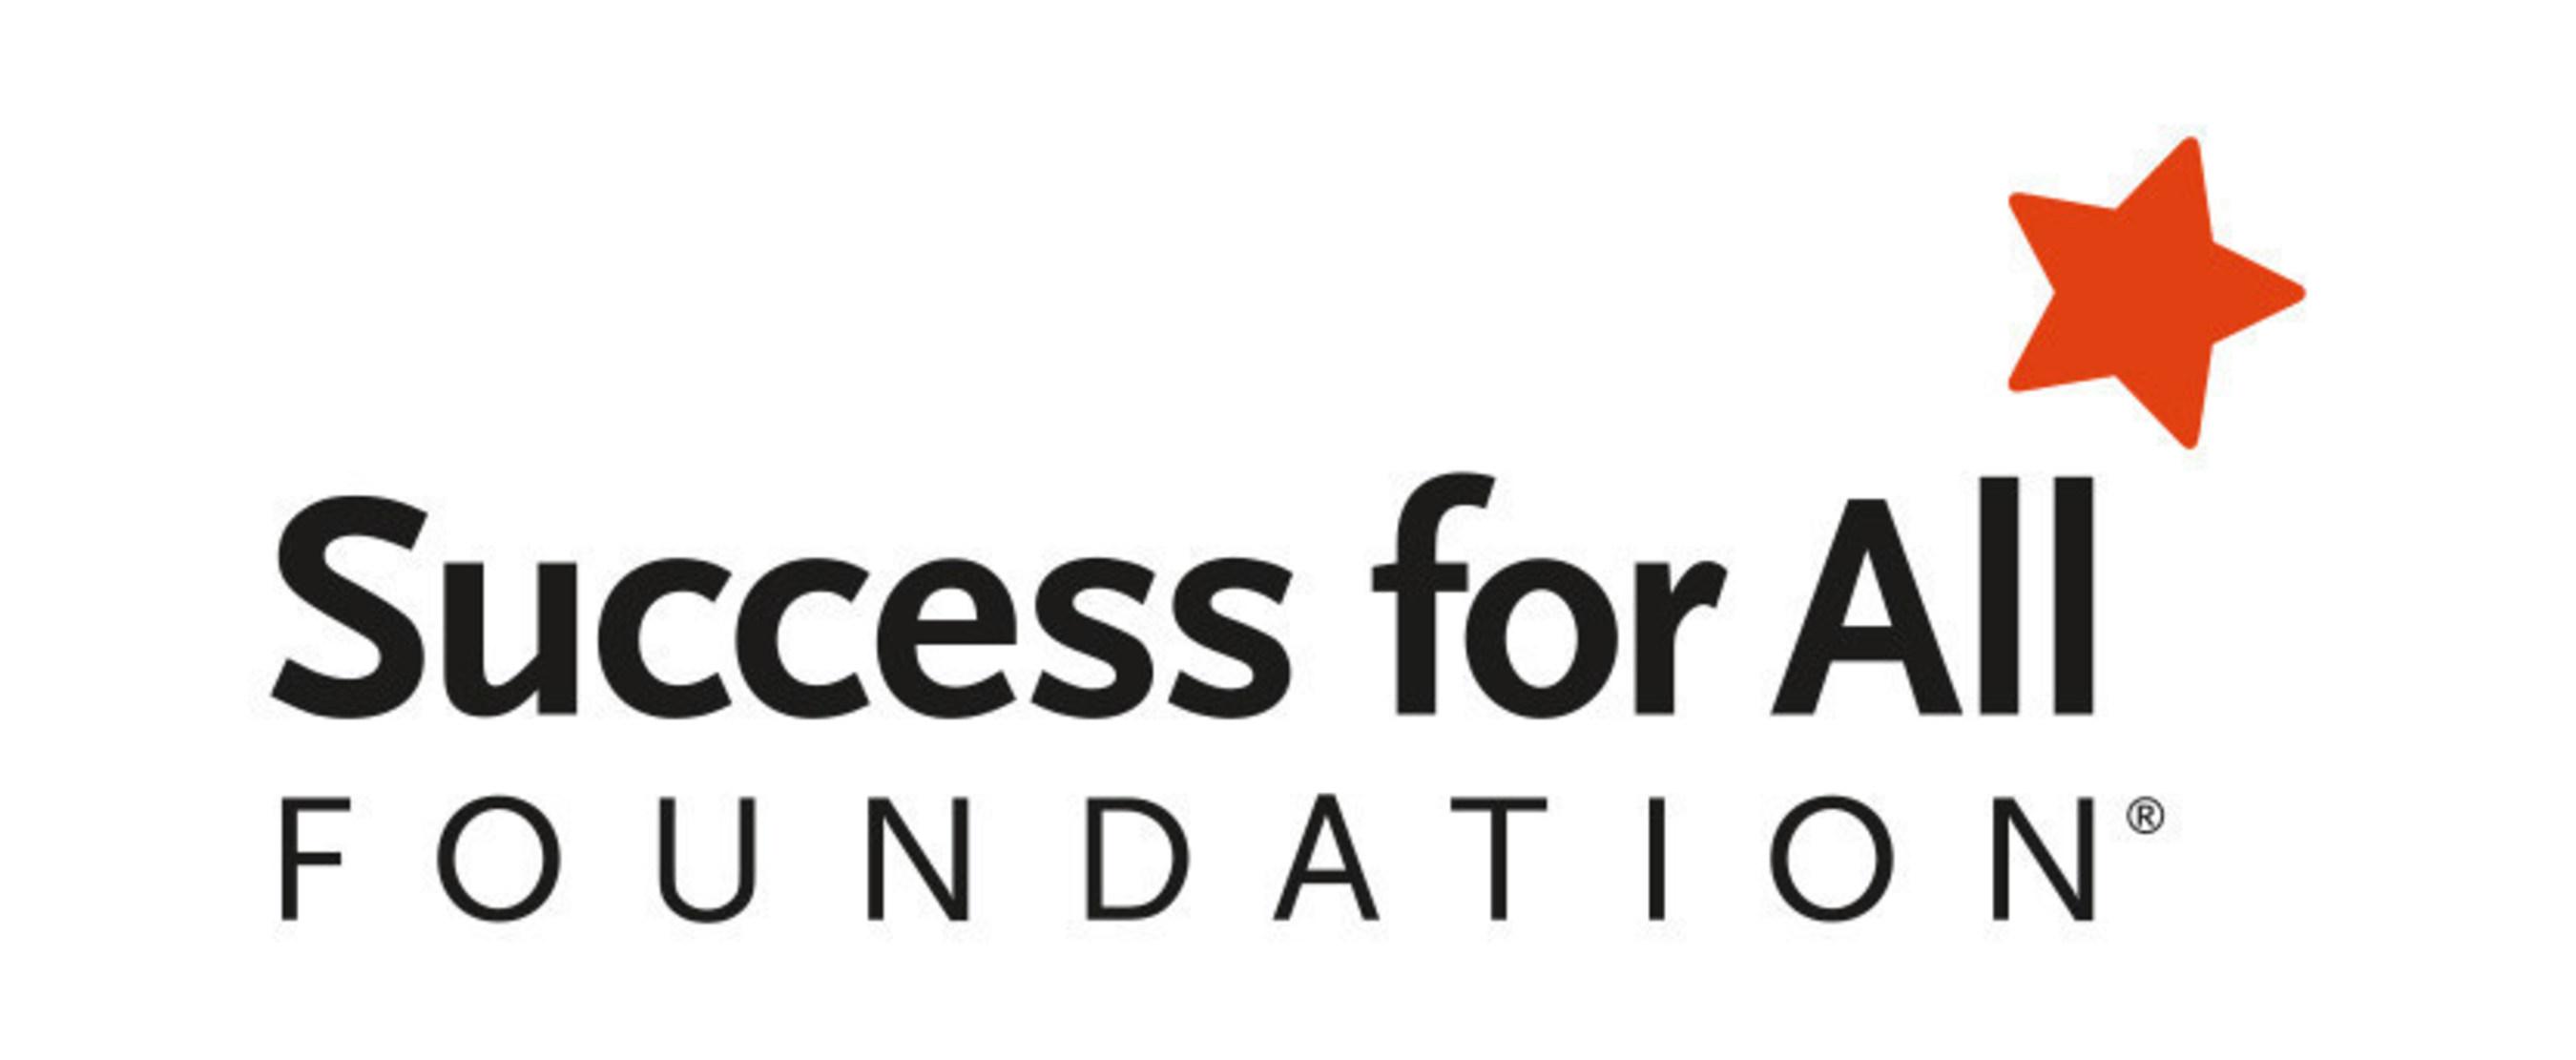 Success for All Foundation logo